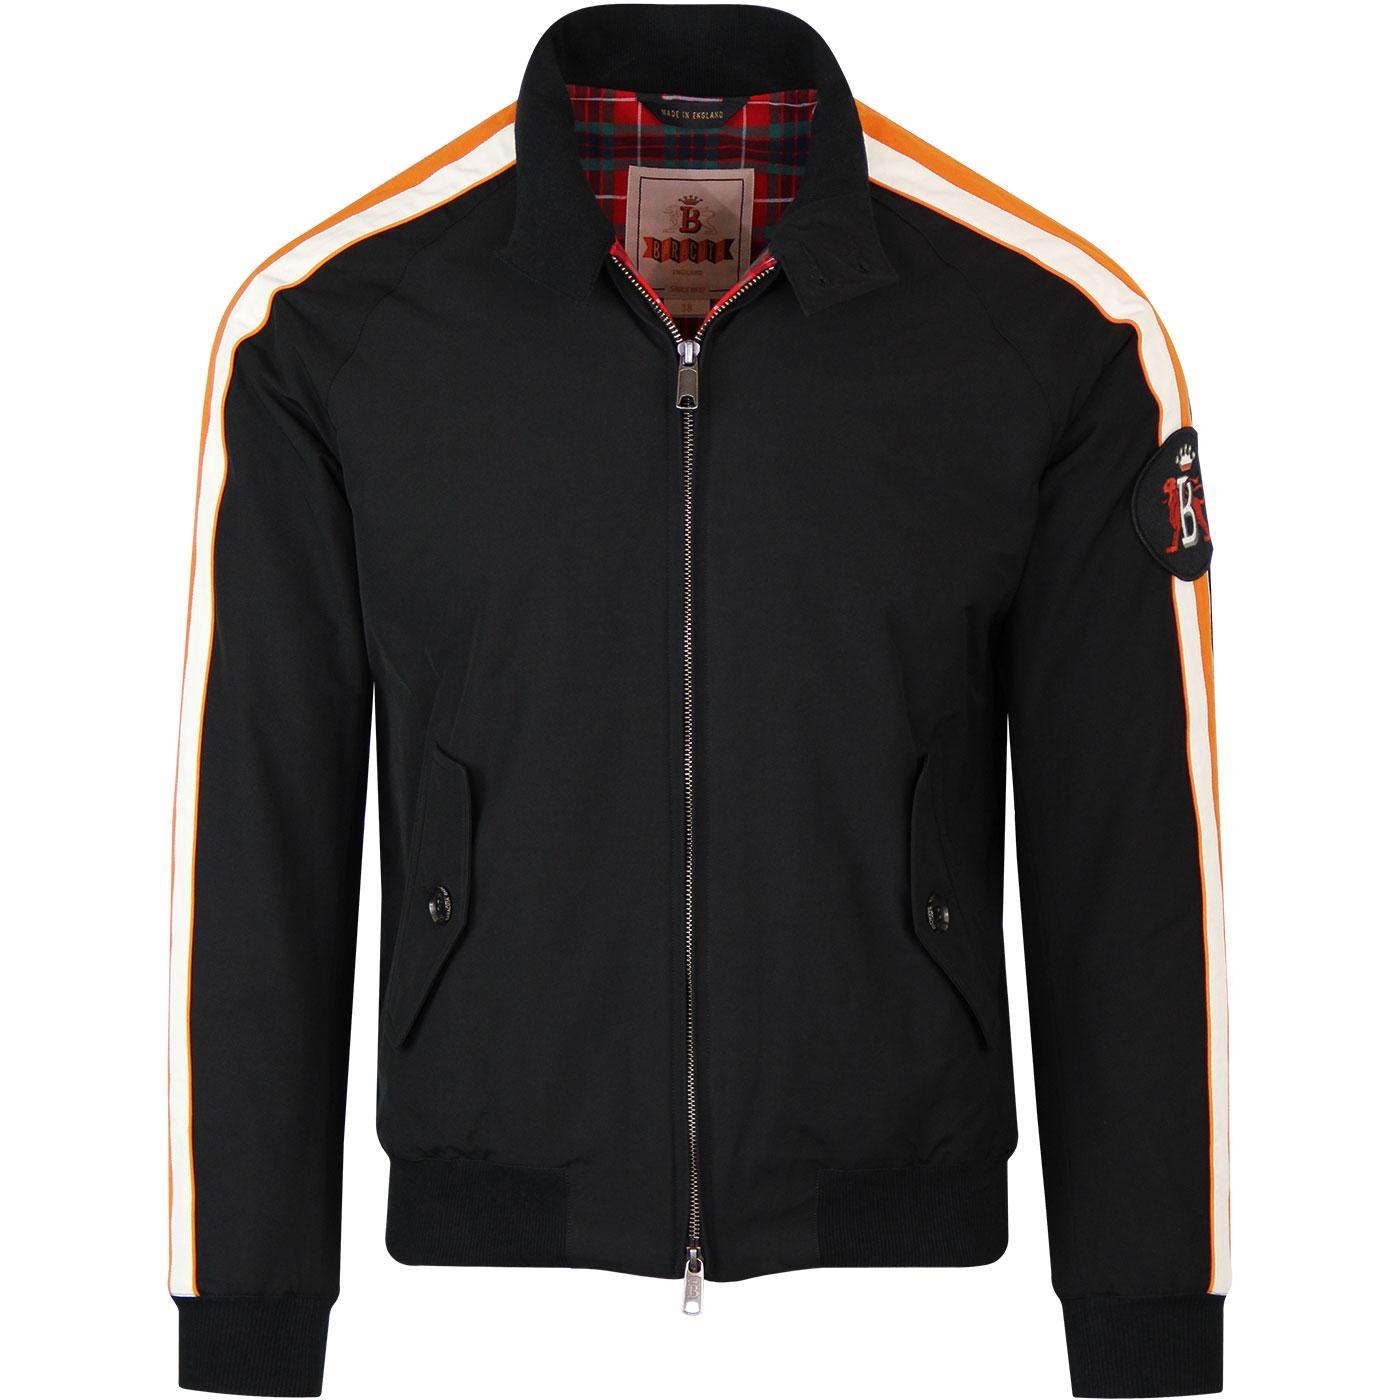 BARACUTA Manx TT G9 Racing Harrington Jacket BLACK